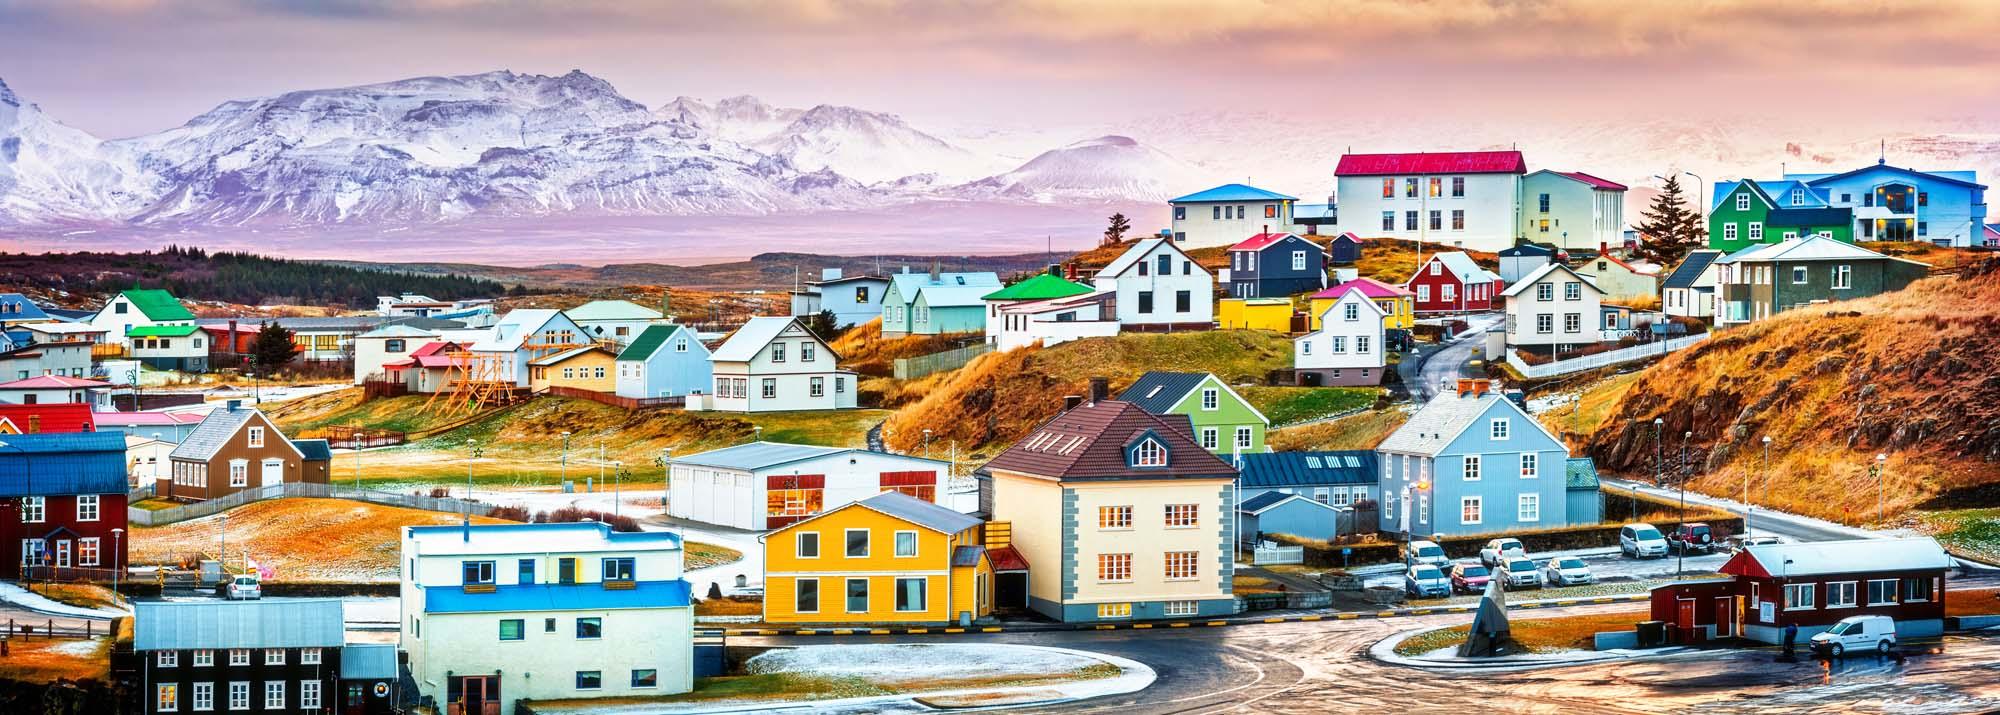 Iceland eid summer destination travel ideas